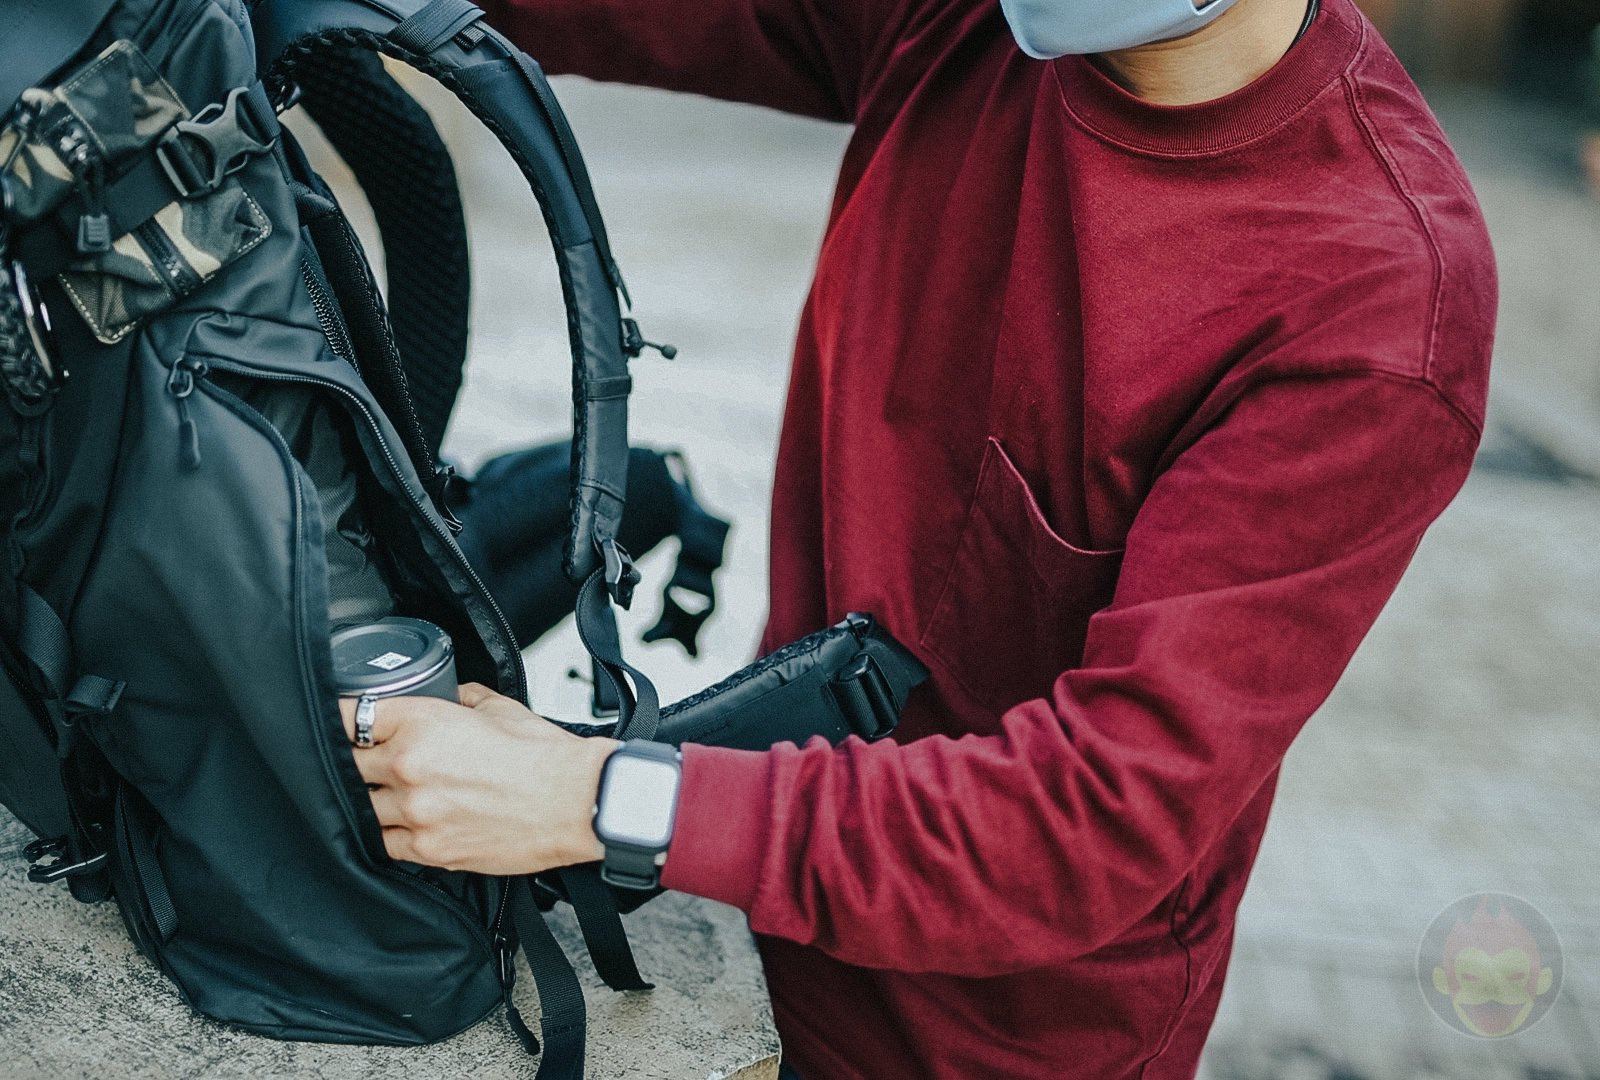 WANDRD FERNWEH Backpack Review 12